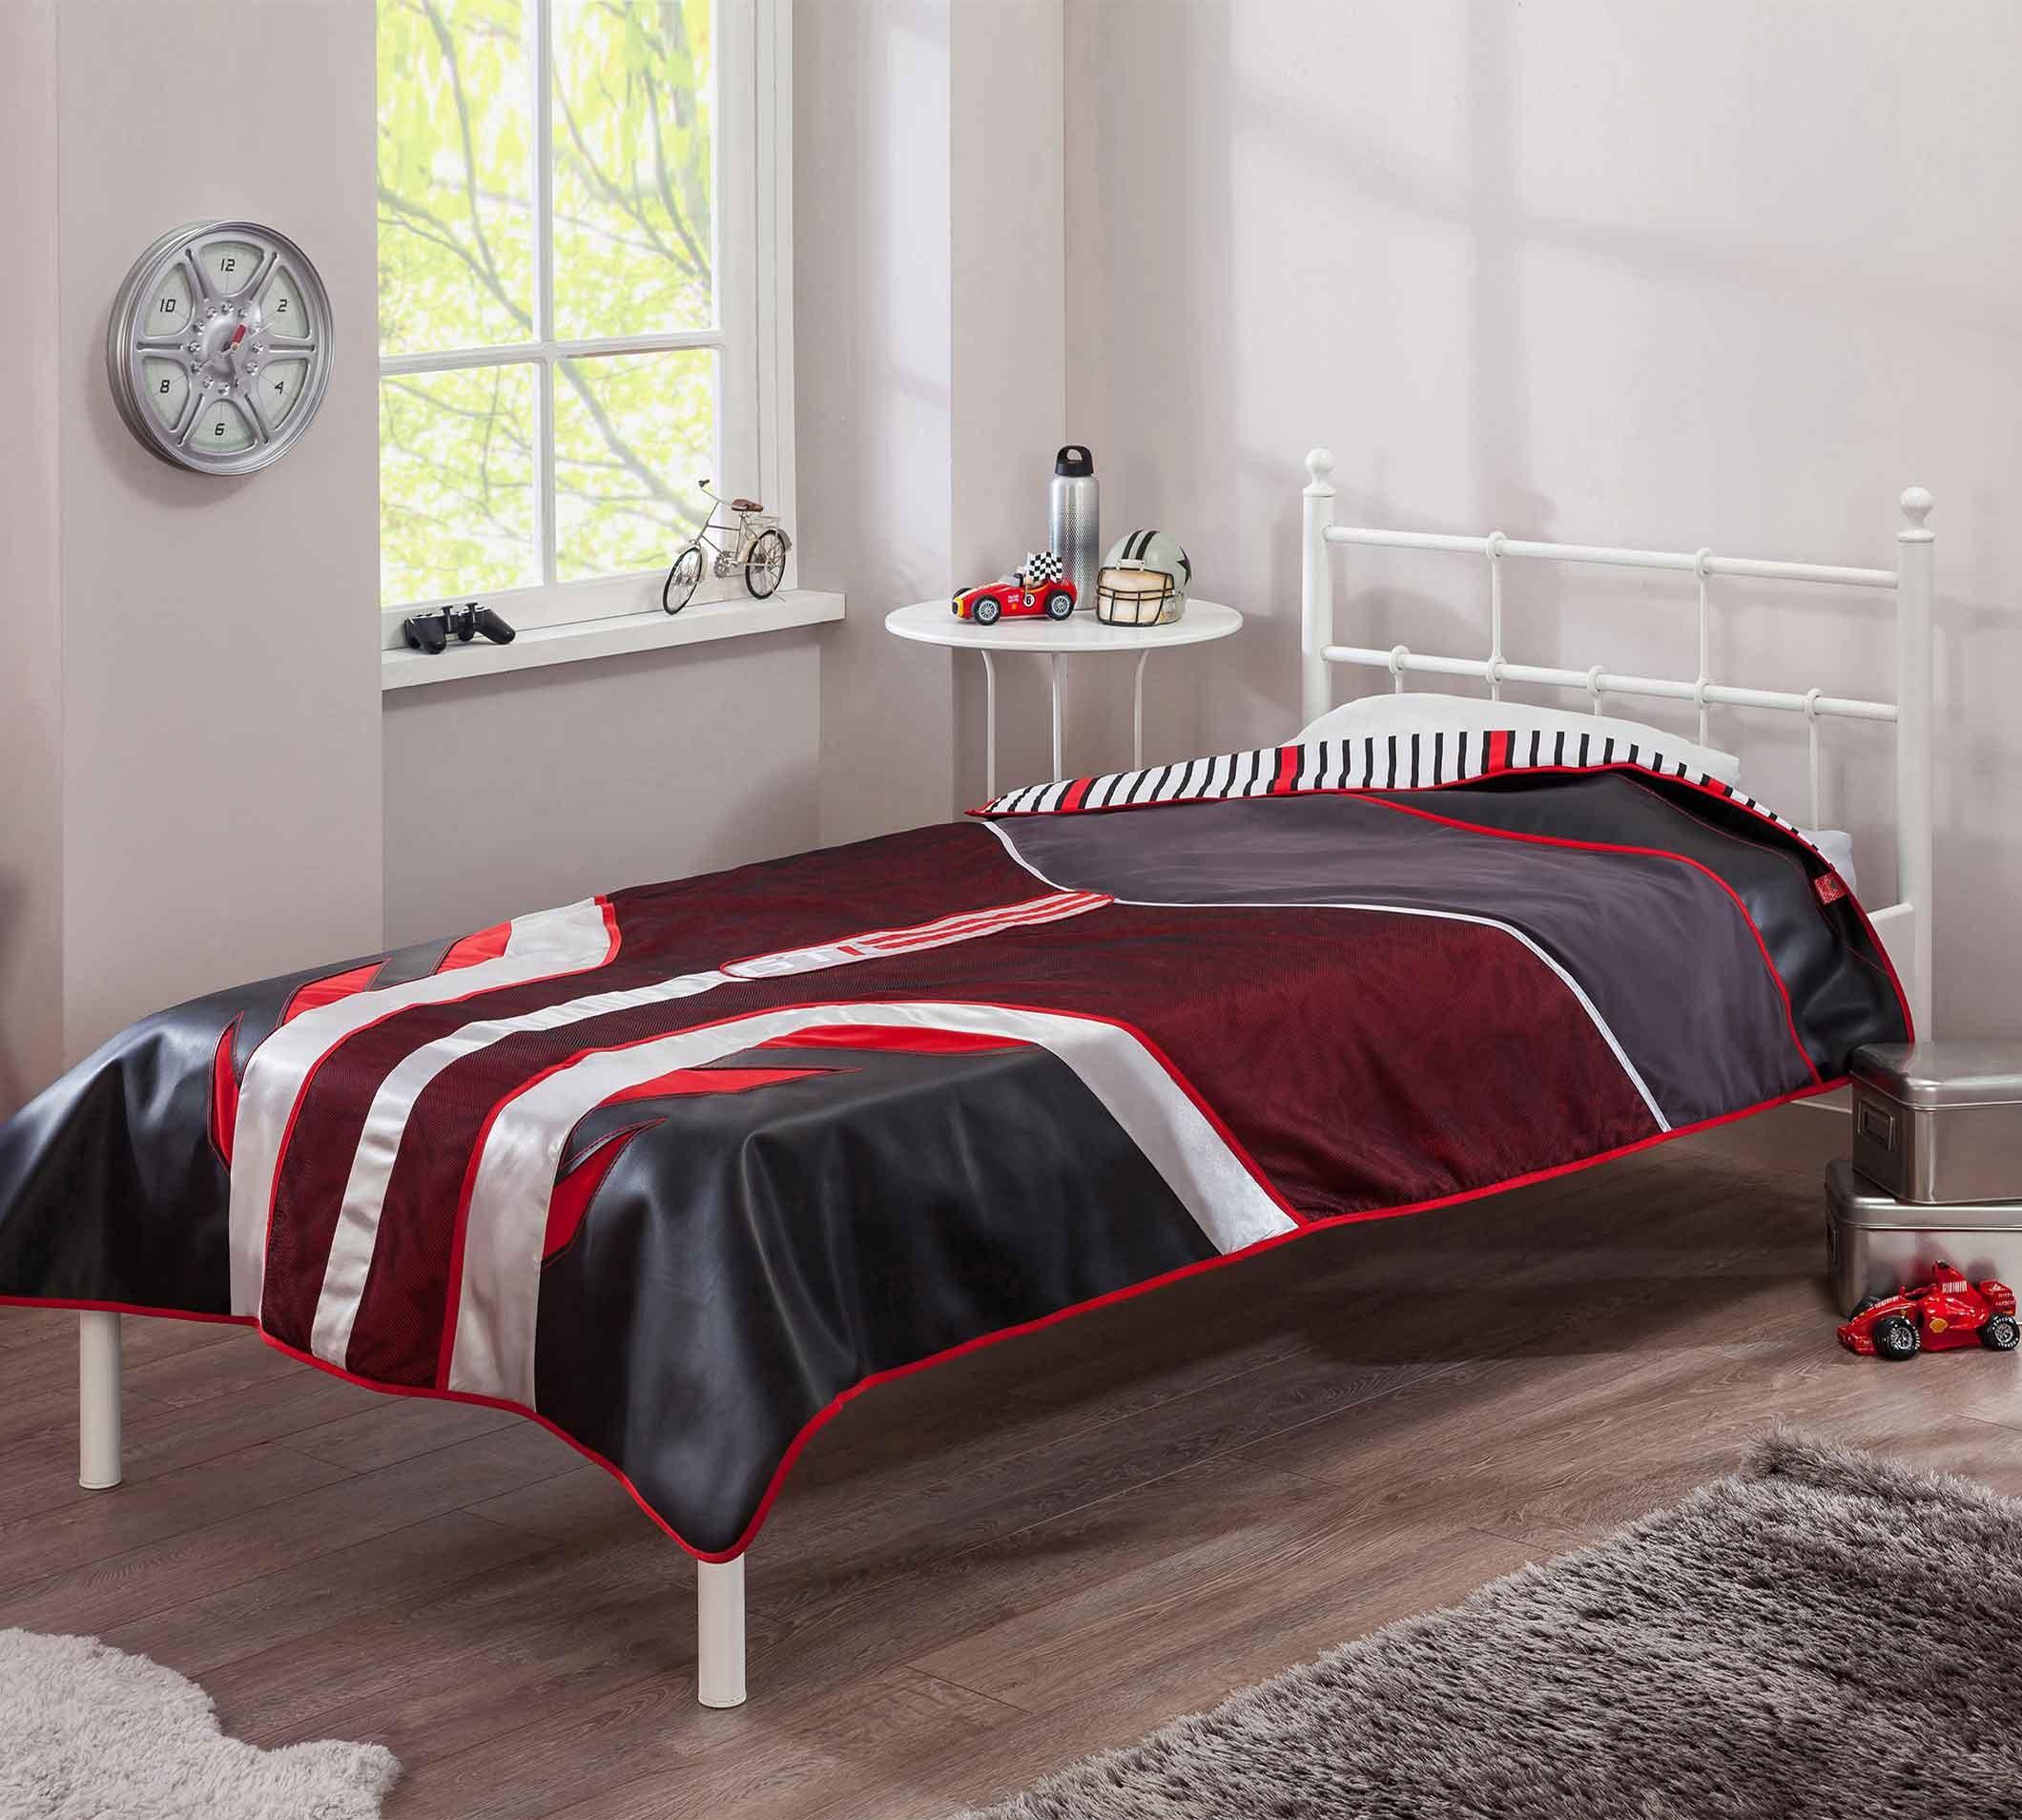 Bipist Bed Cover (90-100 Cm)